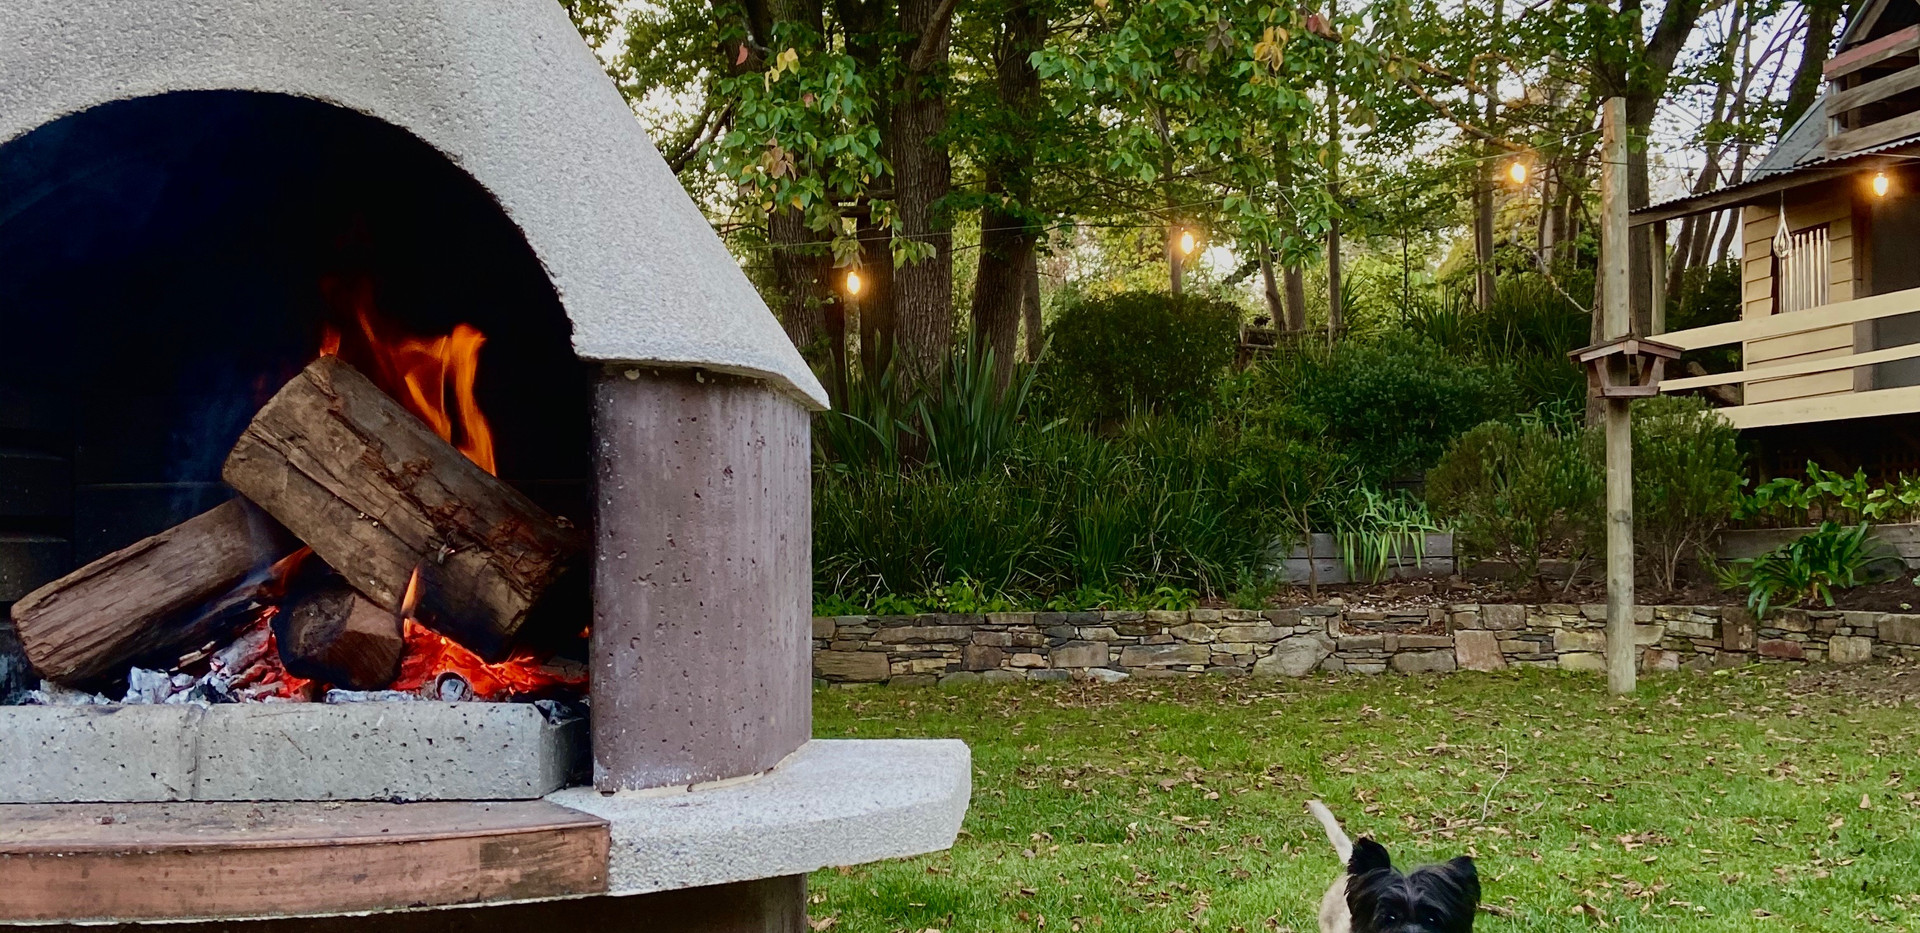 Sunday House - Maldon Photography - Bushbeck Fireplace